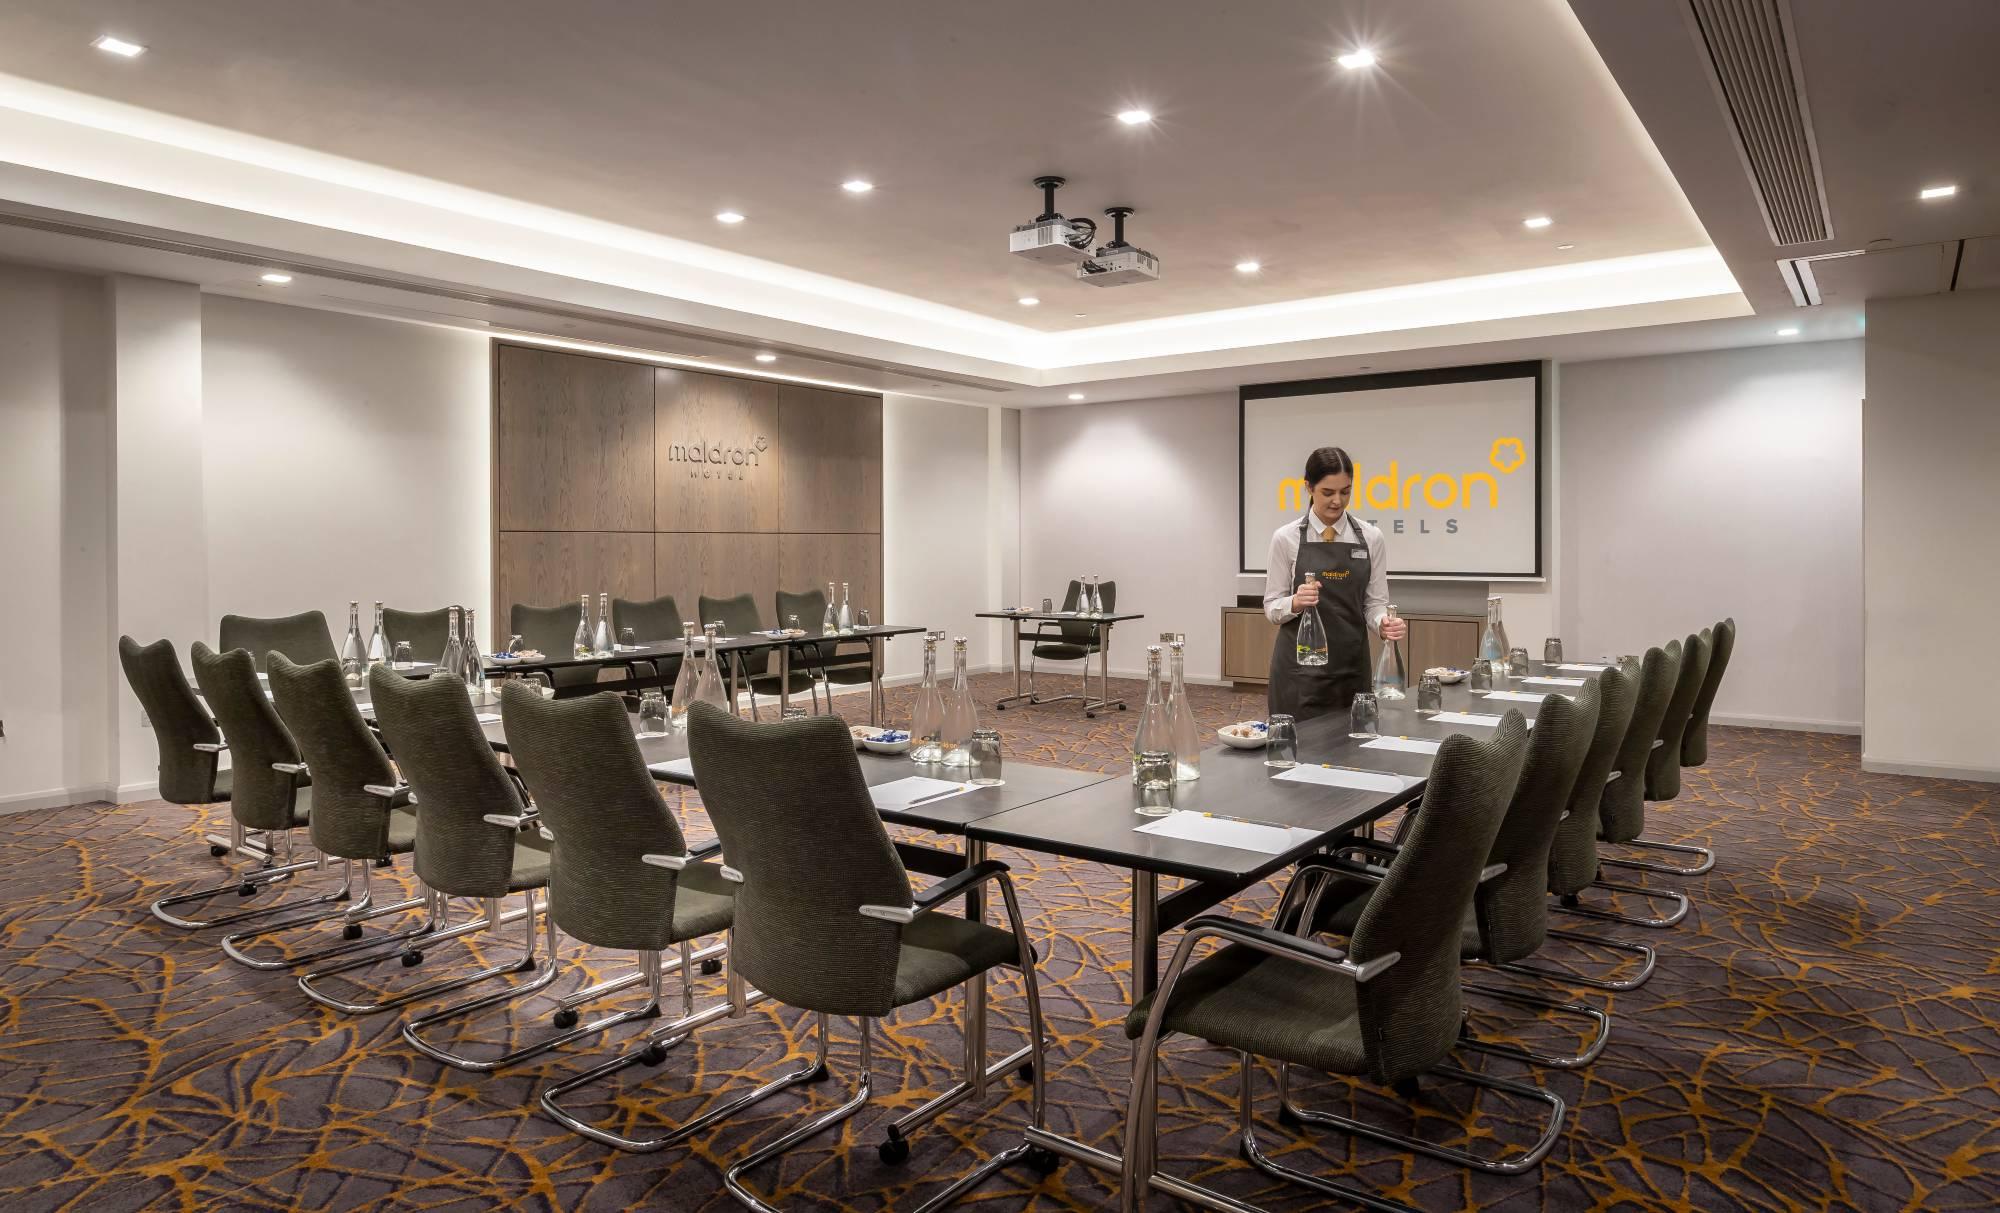 Maldron Hotel meeting room u-shape setup